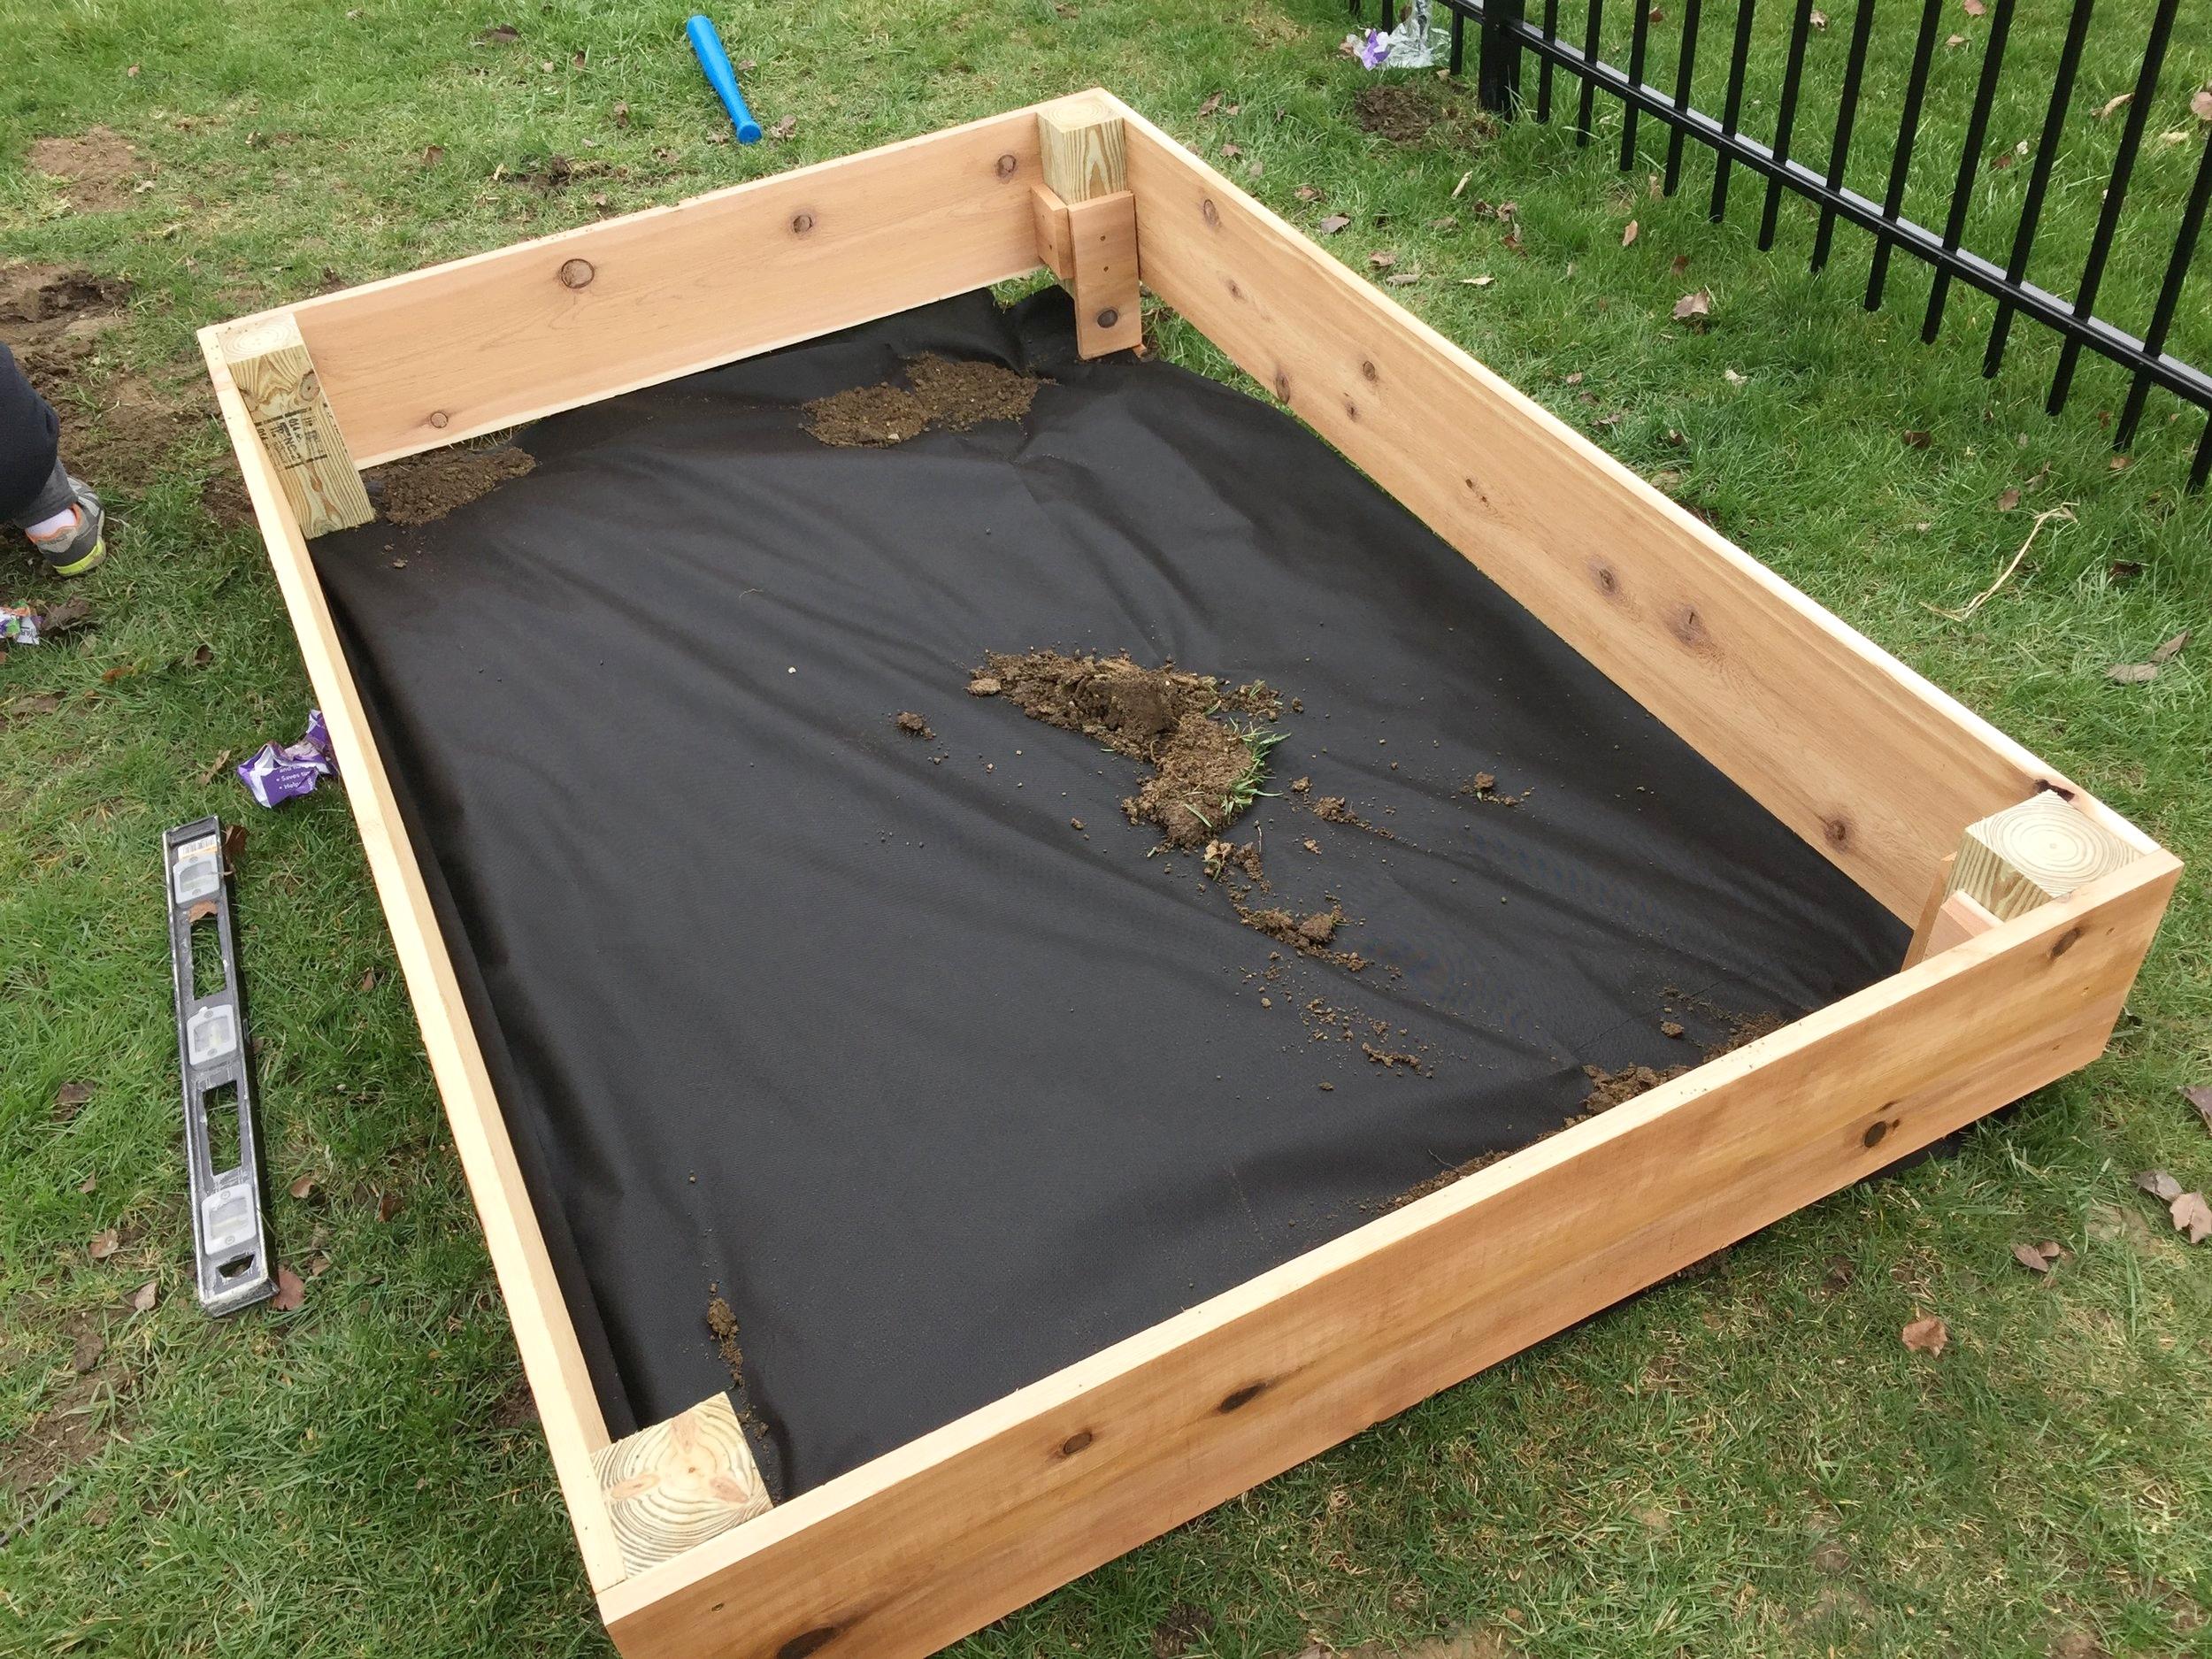 Cedar garden box with the weed control fabric